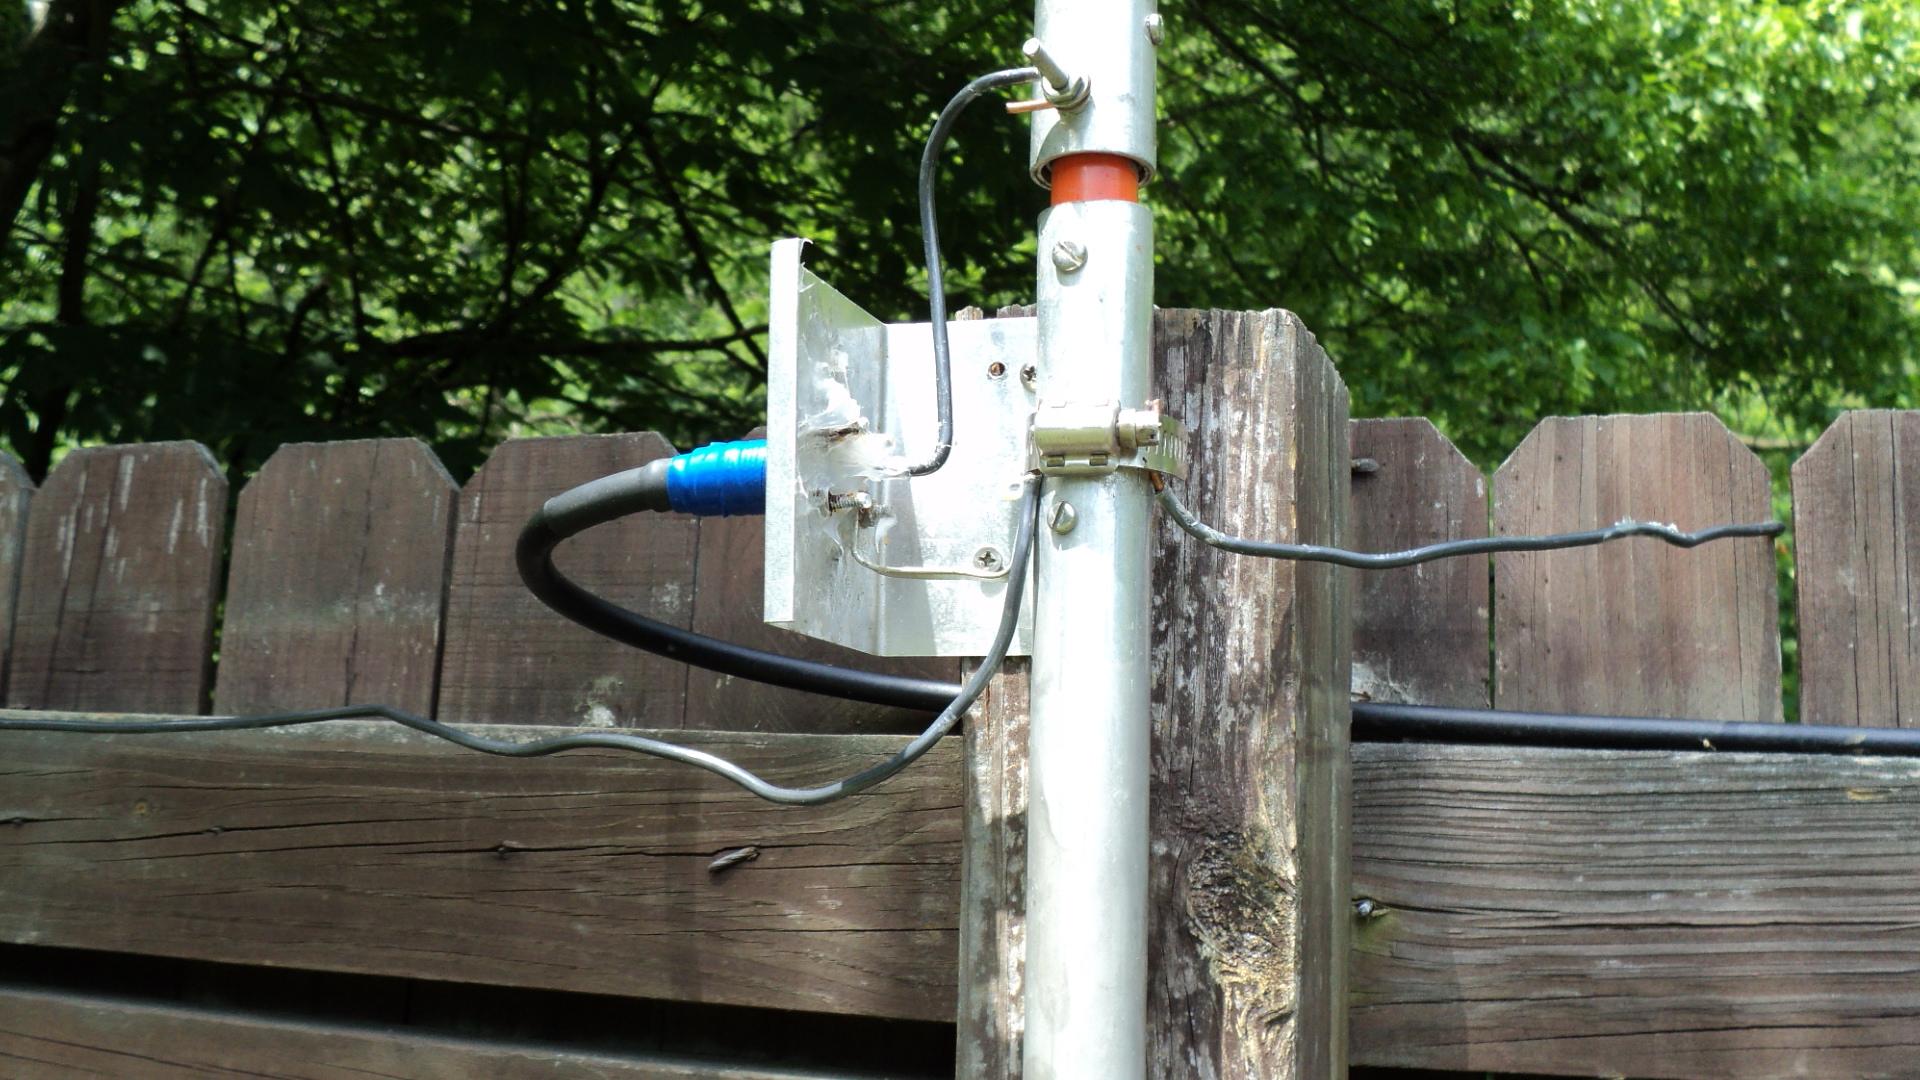 Wiring Up A Meter Box